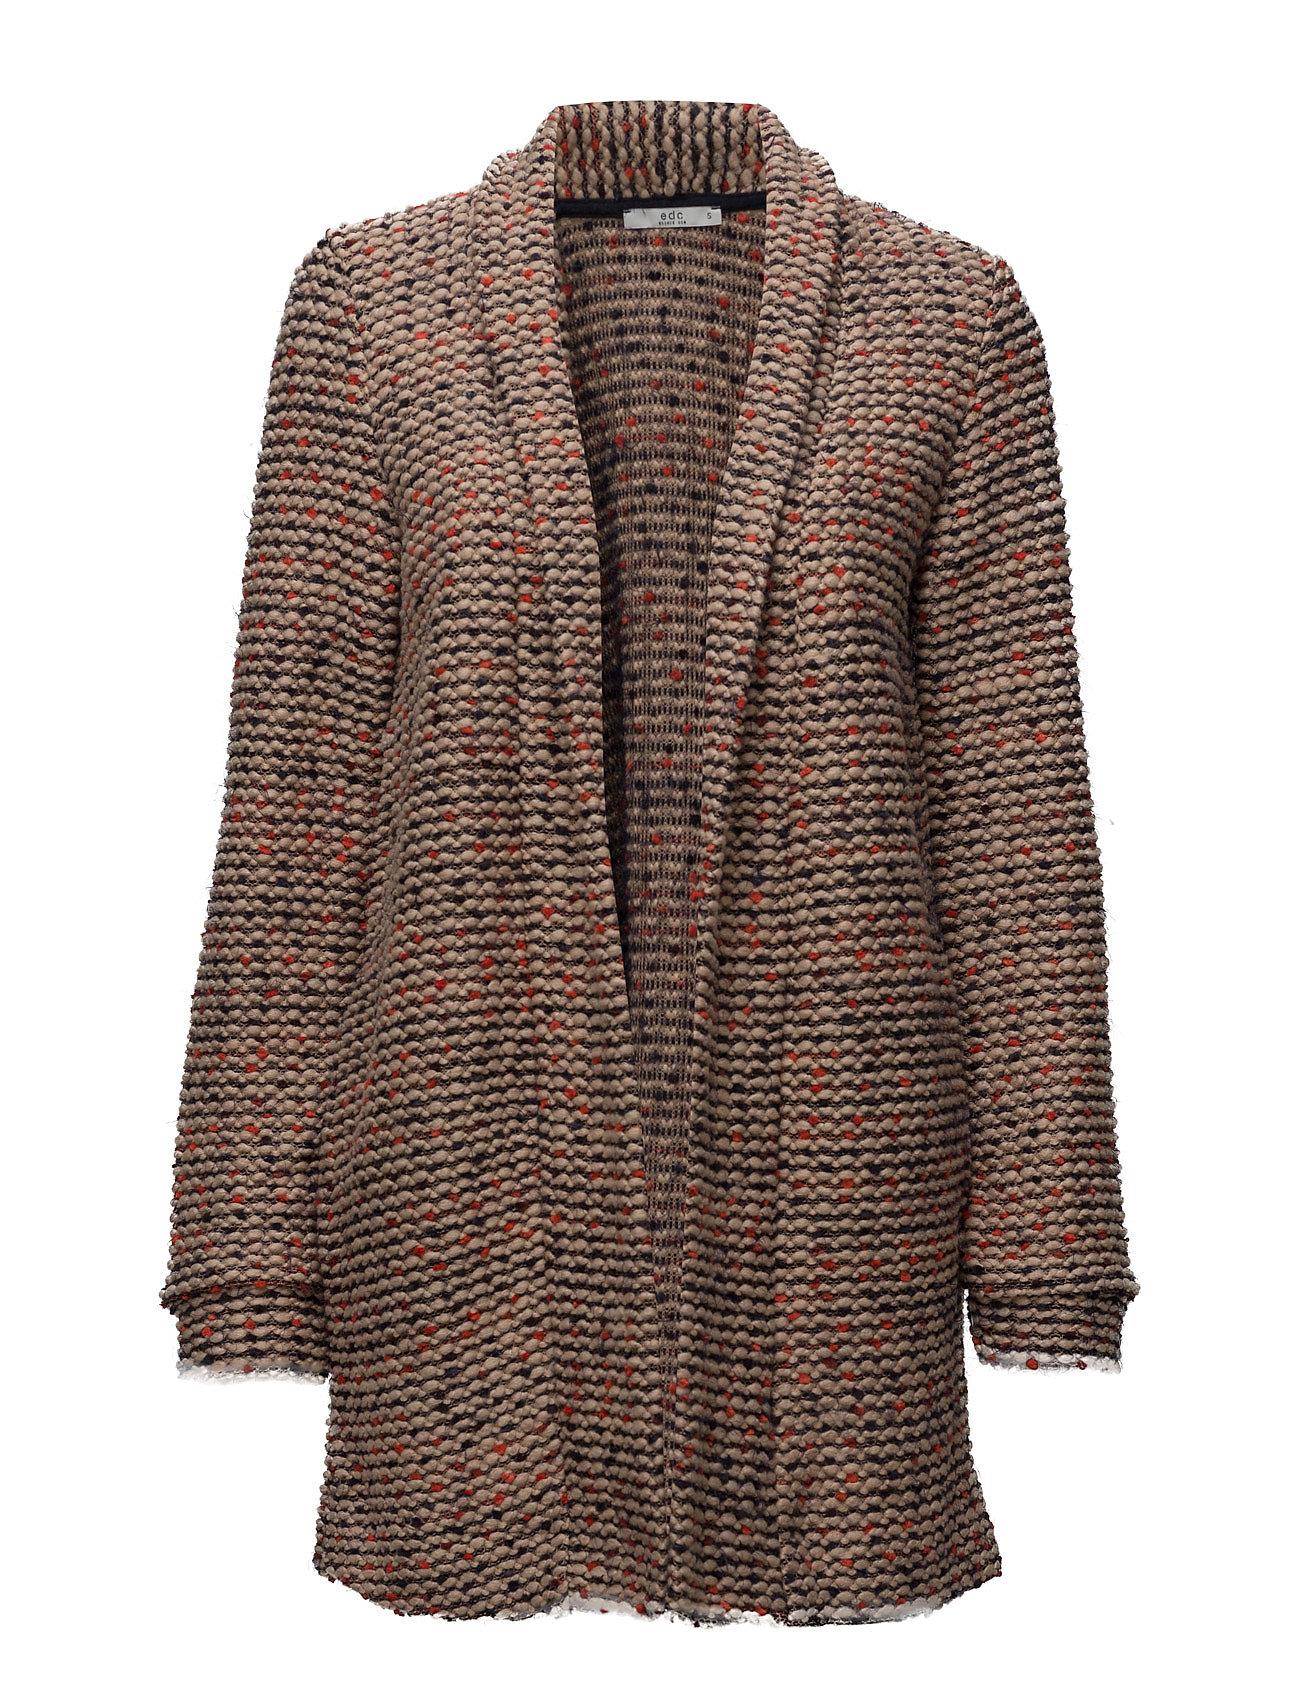 Jackets indoor knitted fra edc by esprit fra boozt.com dk